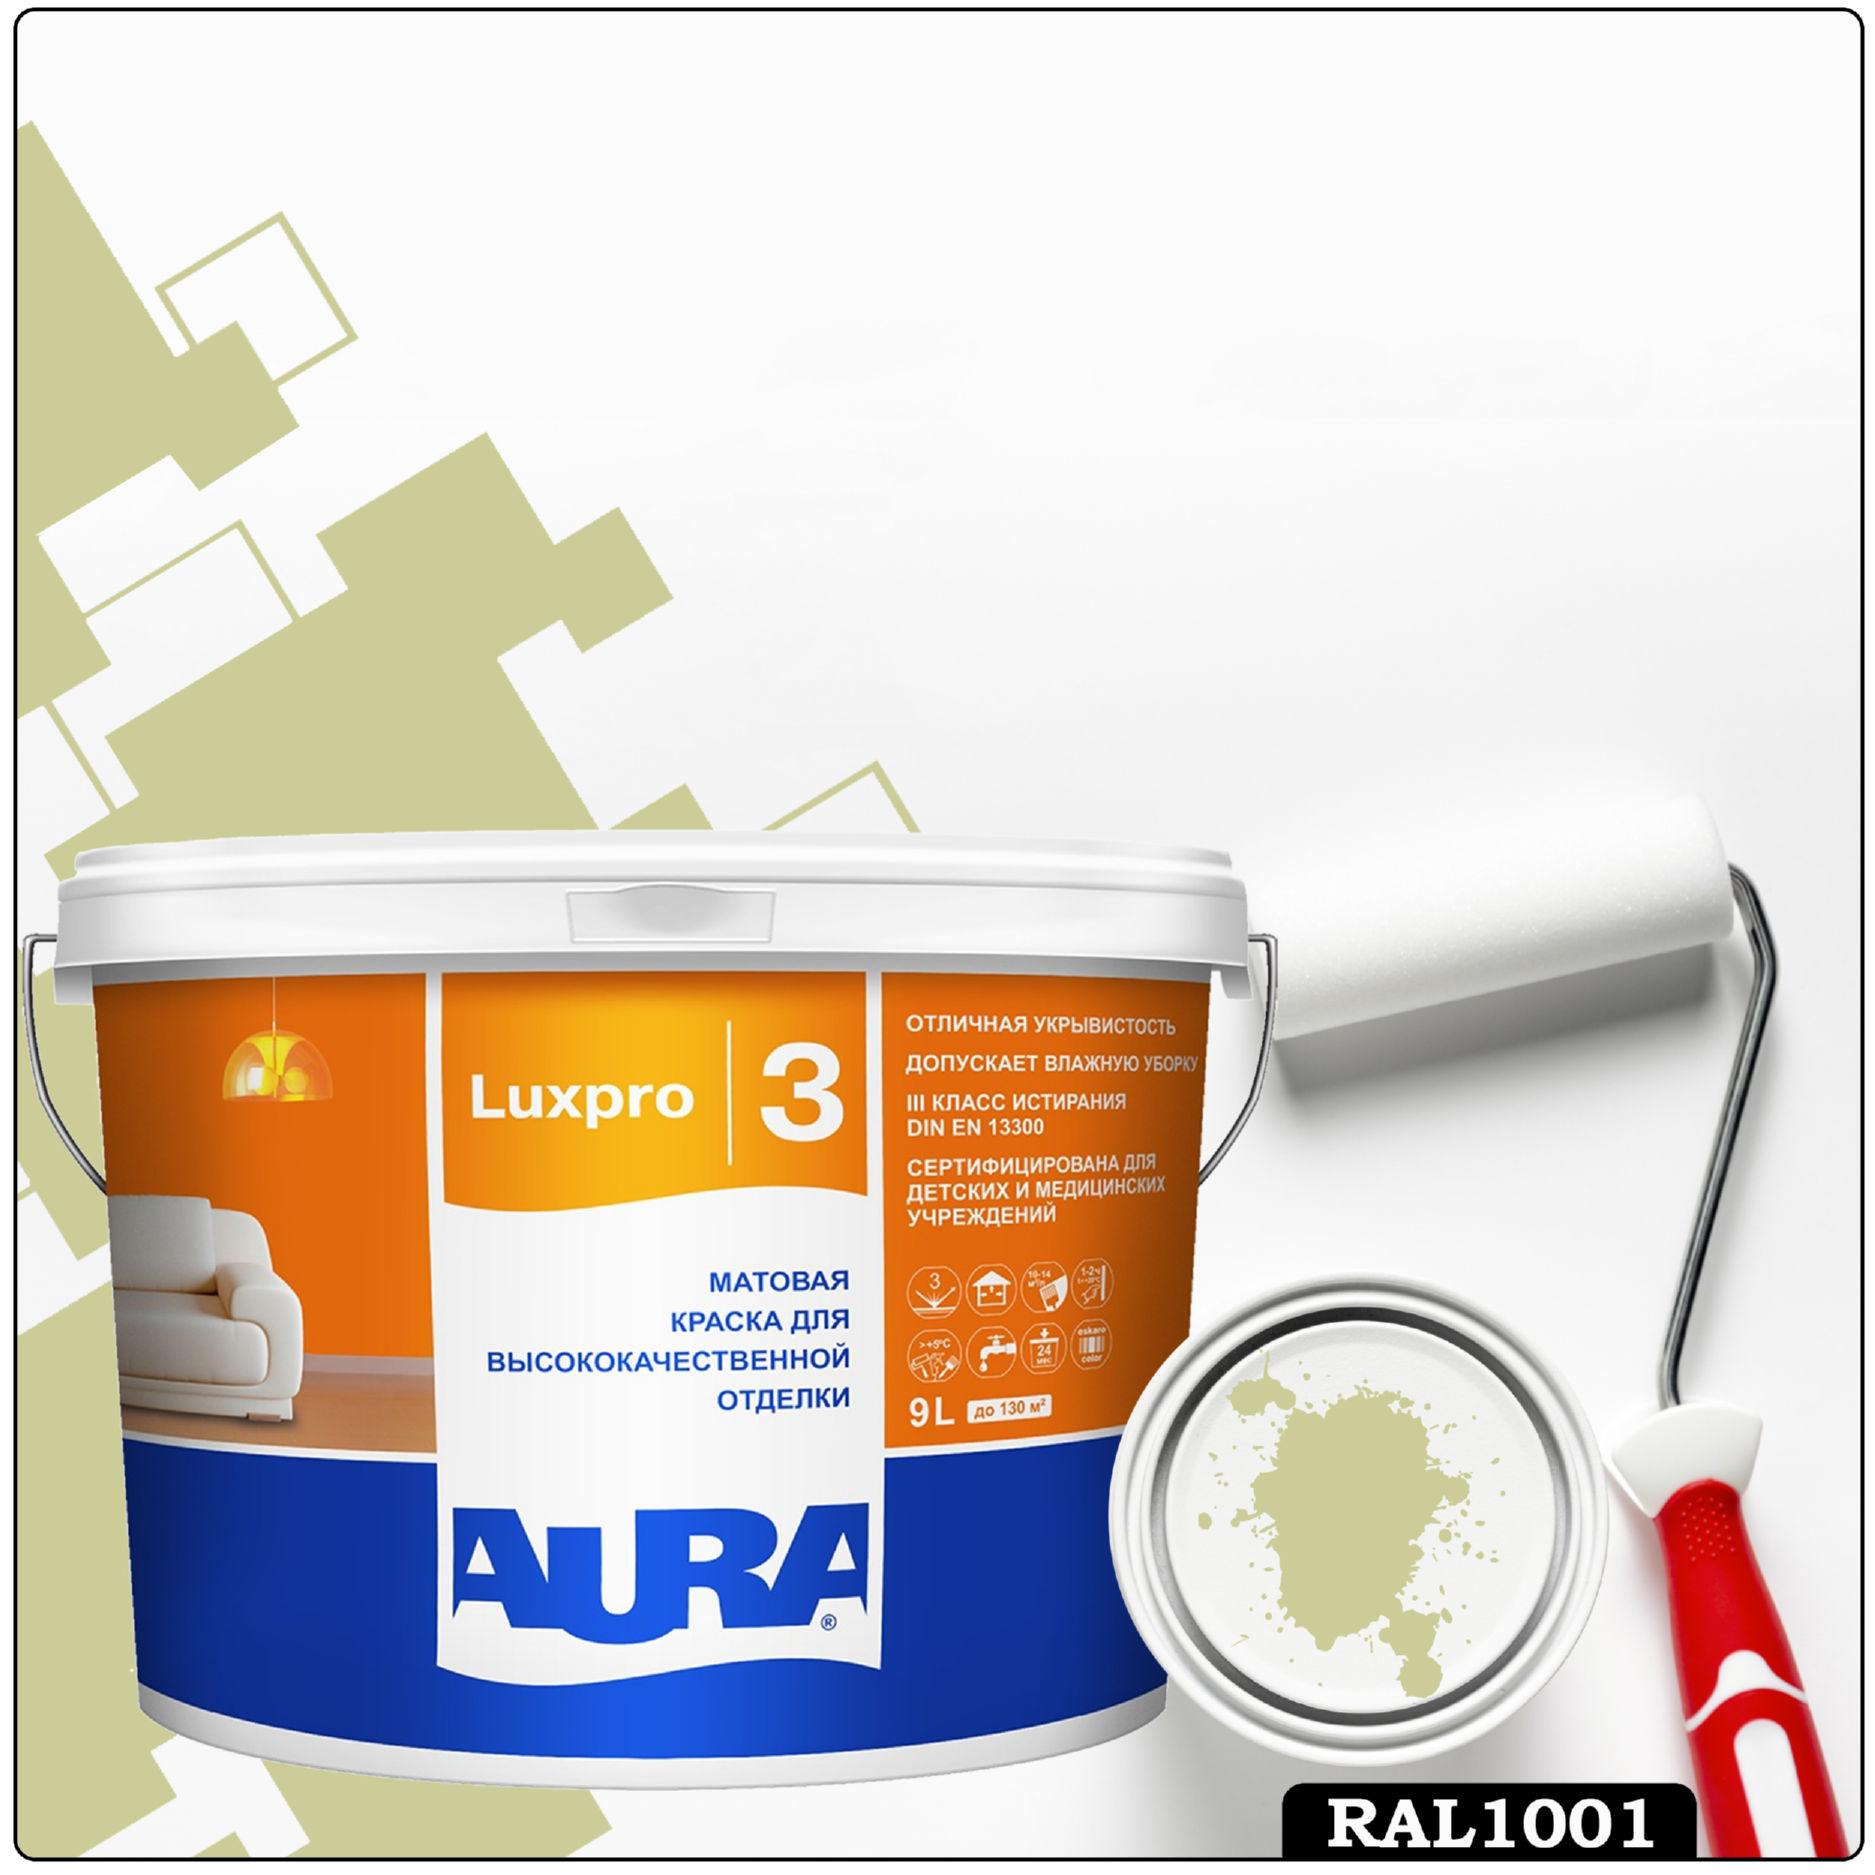 Фото 2 - Краска Aura LuxPRO 3, RAL 1001 Бежевый, латексная, шелково-матовая, интерьерная, 9л, Аура.